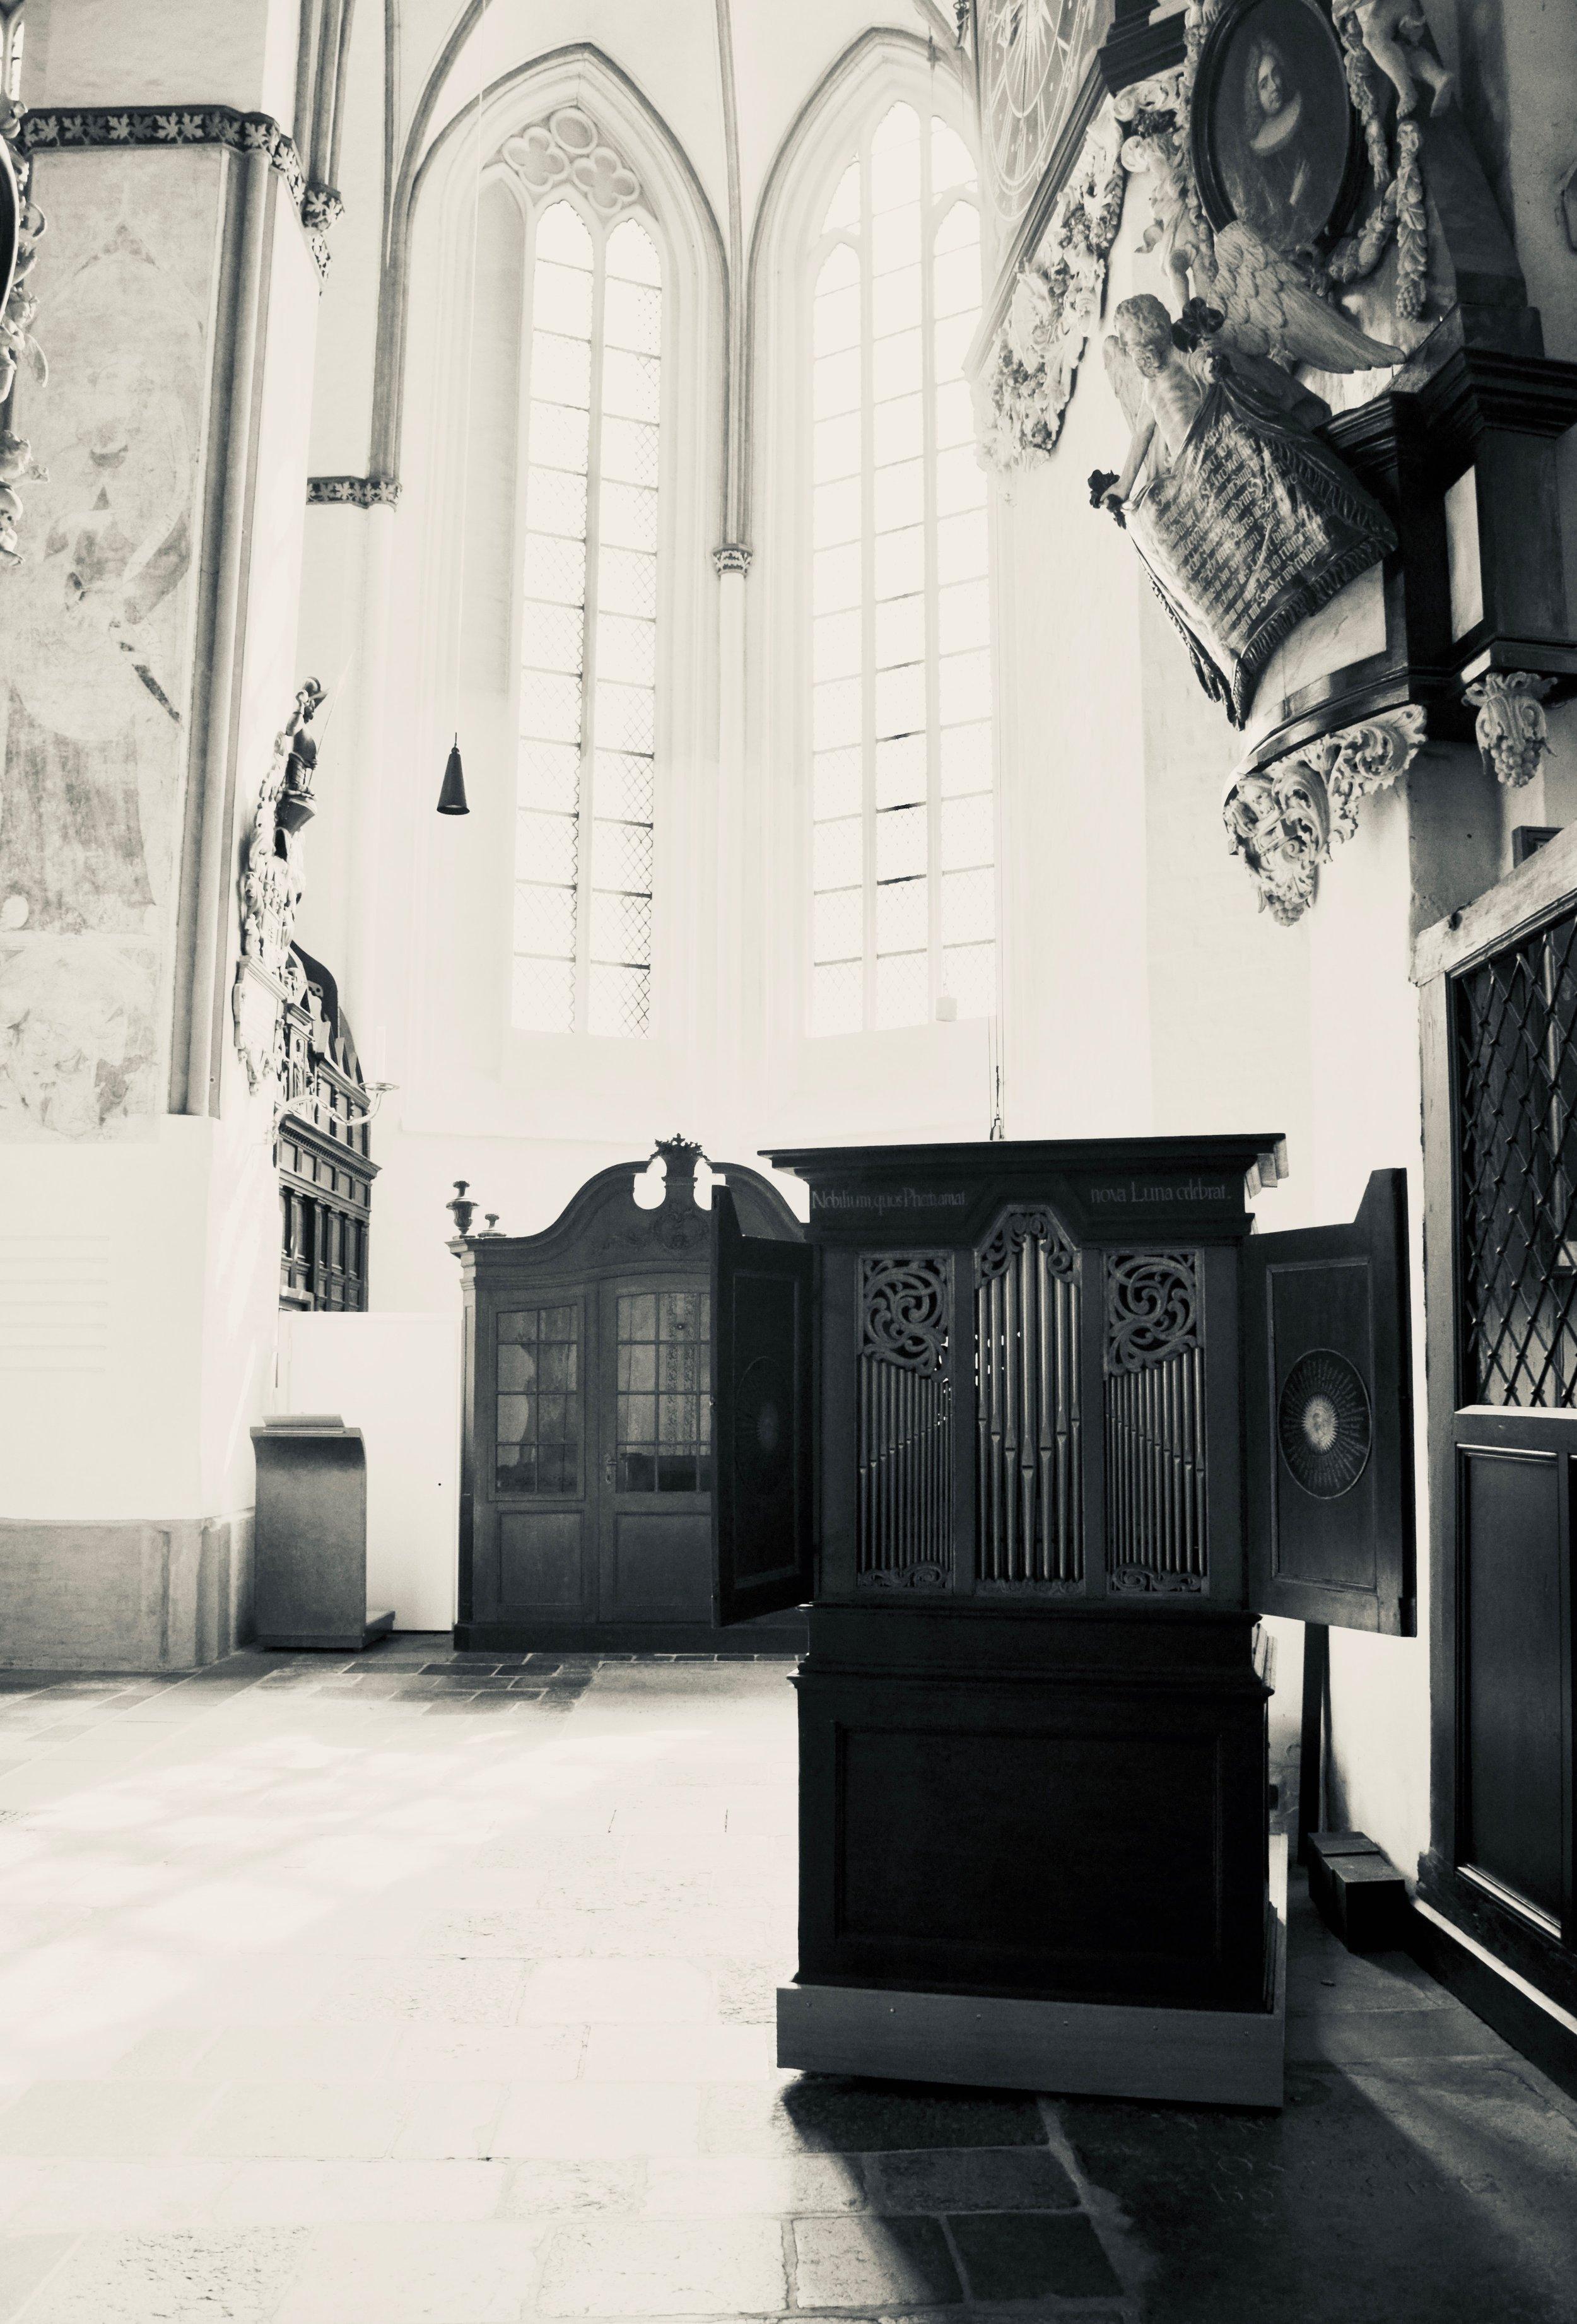 1673 Richborn organ, St. Jakobi, Lübeck.